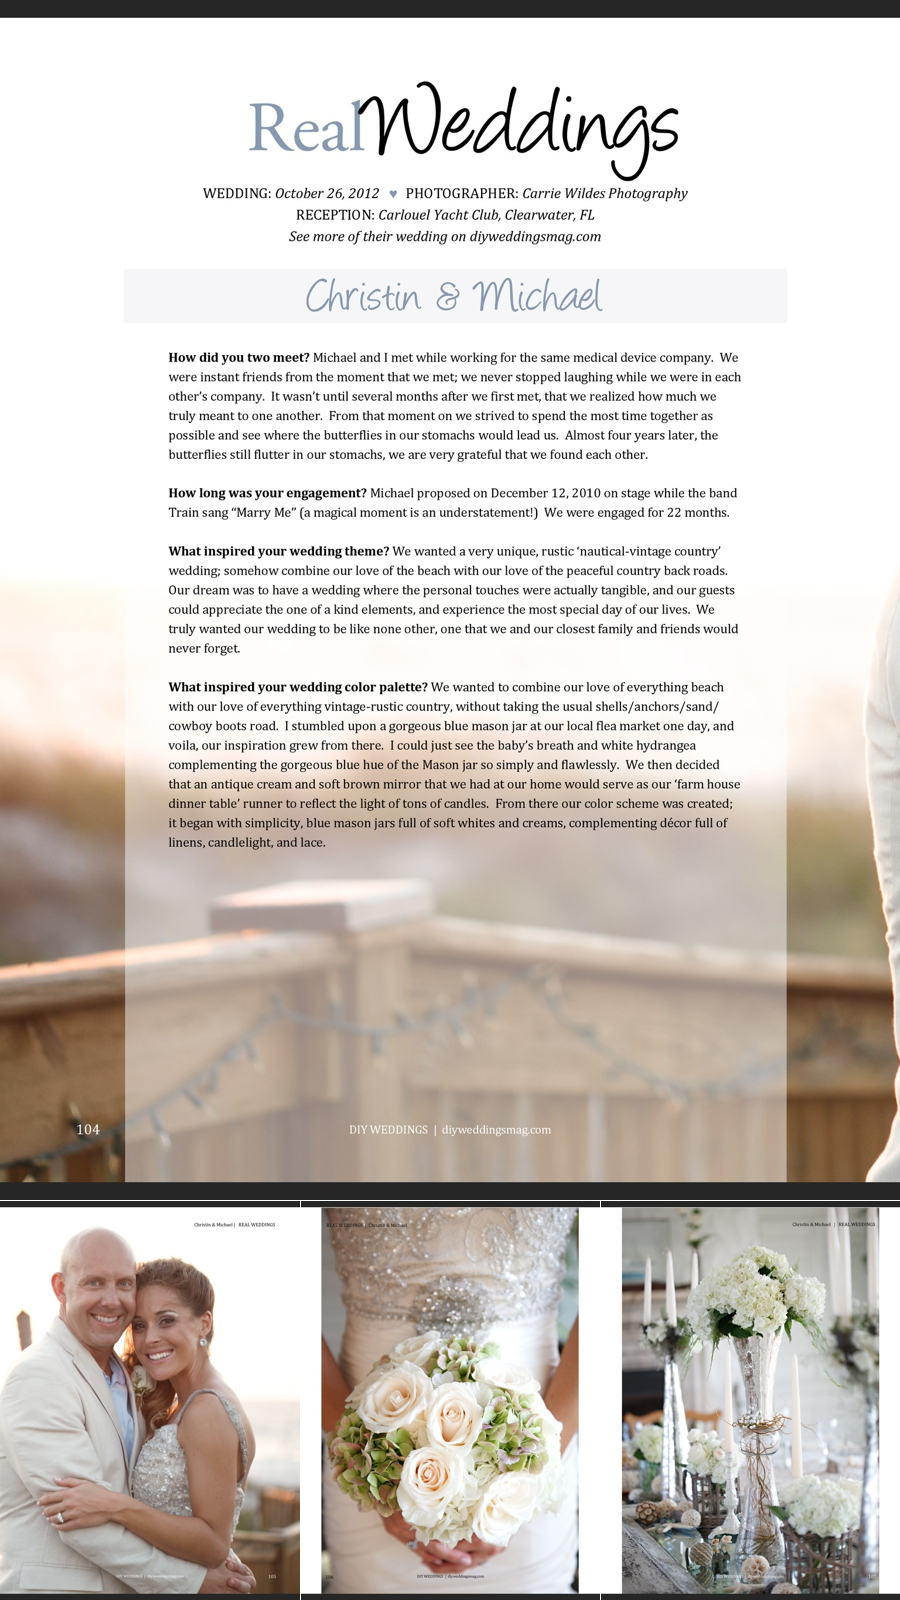 9_3_13 DIY Real Weddings Magazine Feature Carlouel Yacht Club_0002.jpg